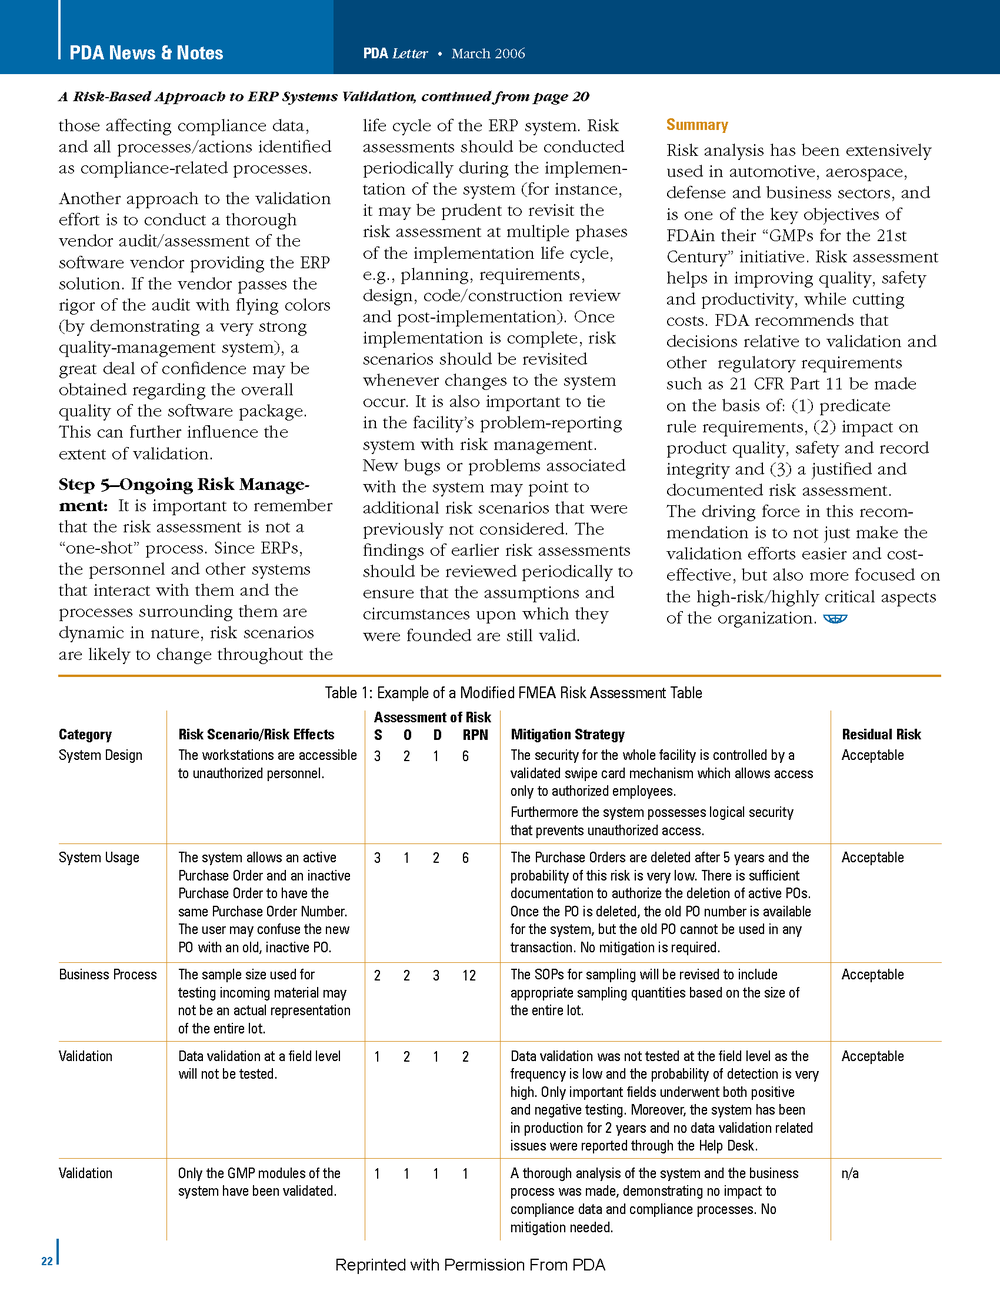 PDA Letter - ValiMation - ERP Validation - Risk Management Article_Page_4.png